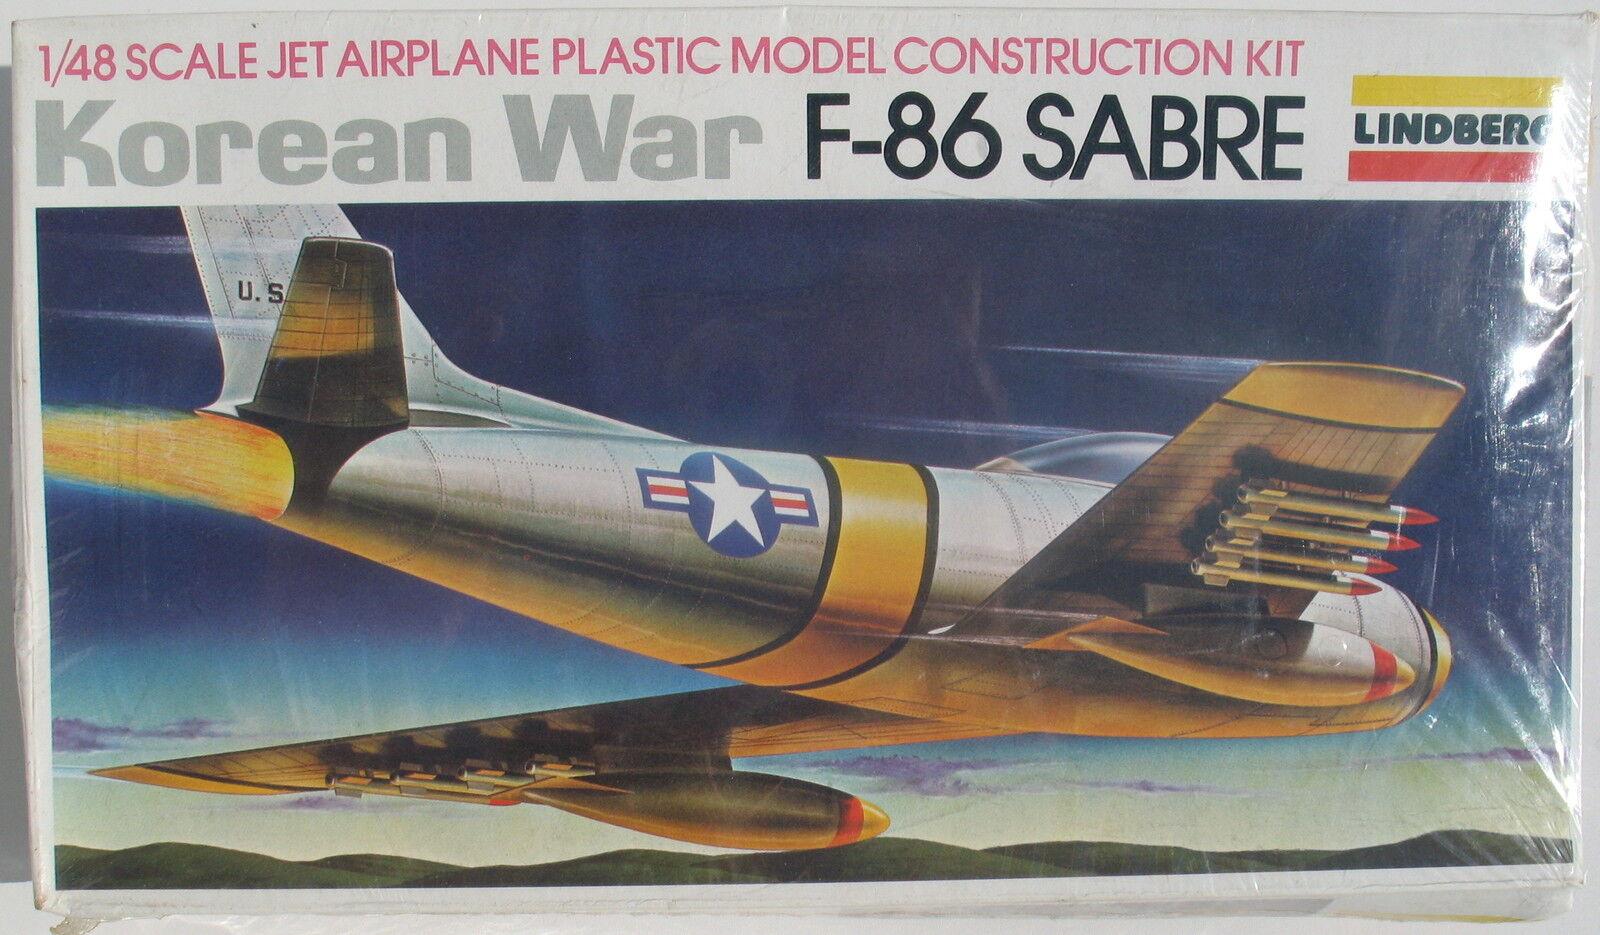 LINDBERG 2323 - F-86 SABRE - Korean War - 1 48 - Flugzeug Modellbausatz - Kit